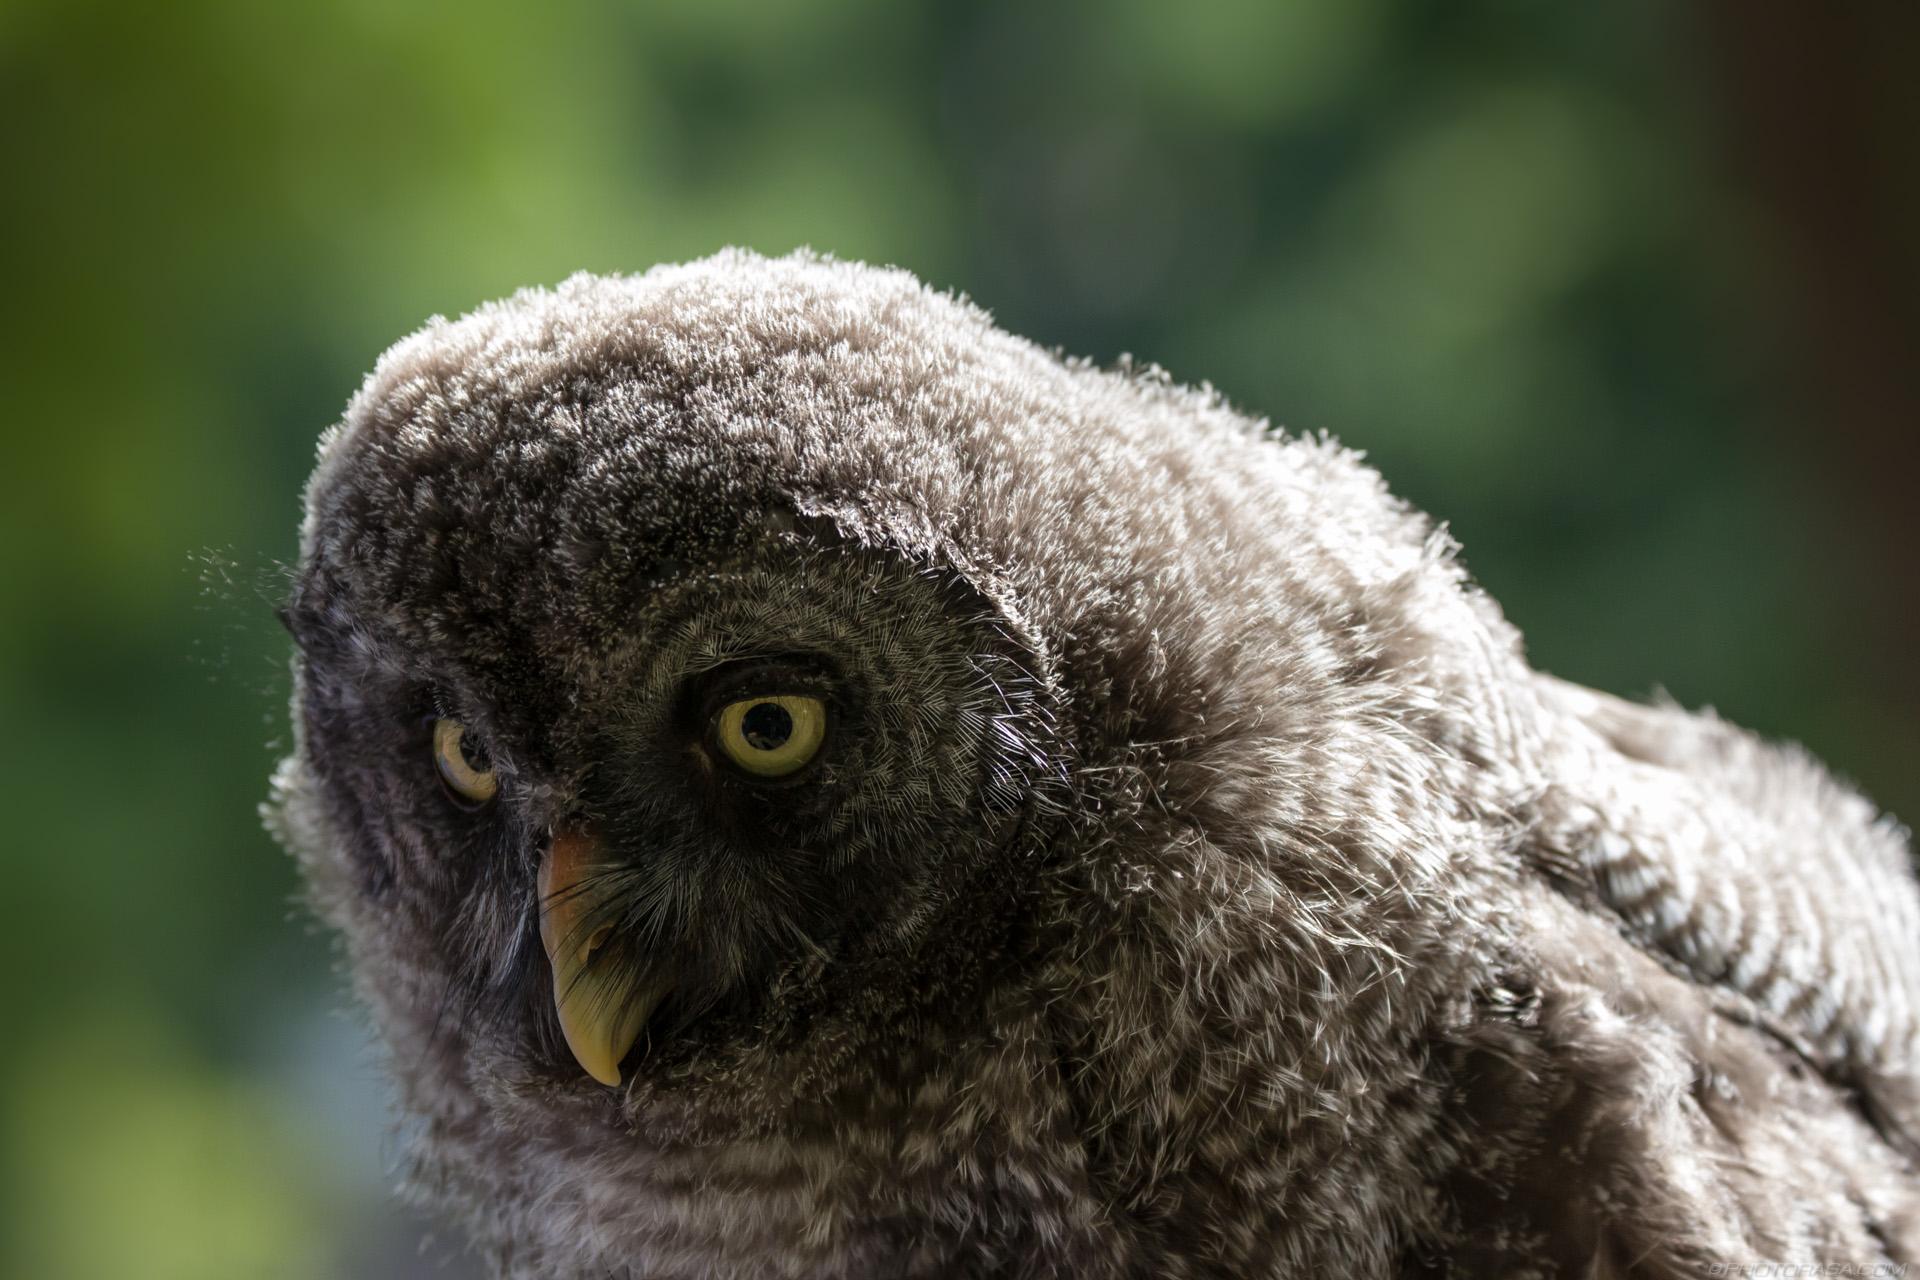 https://photorasa.com/owls/grey-fluffy-owl/